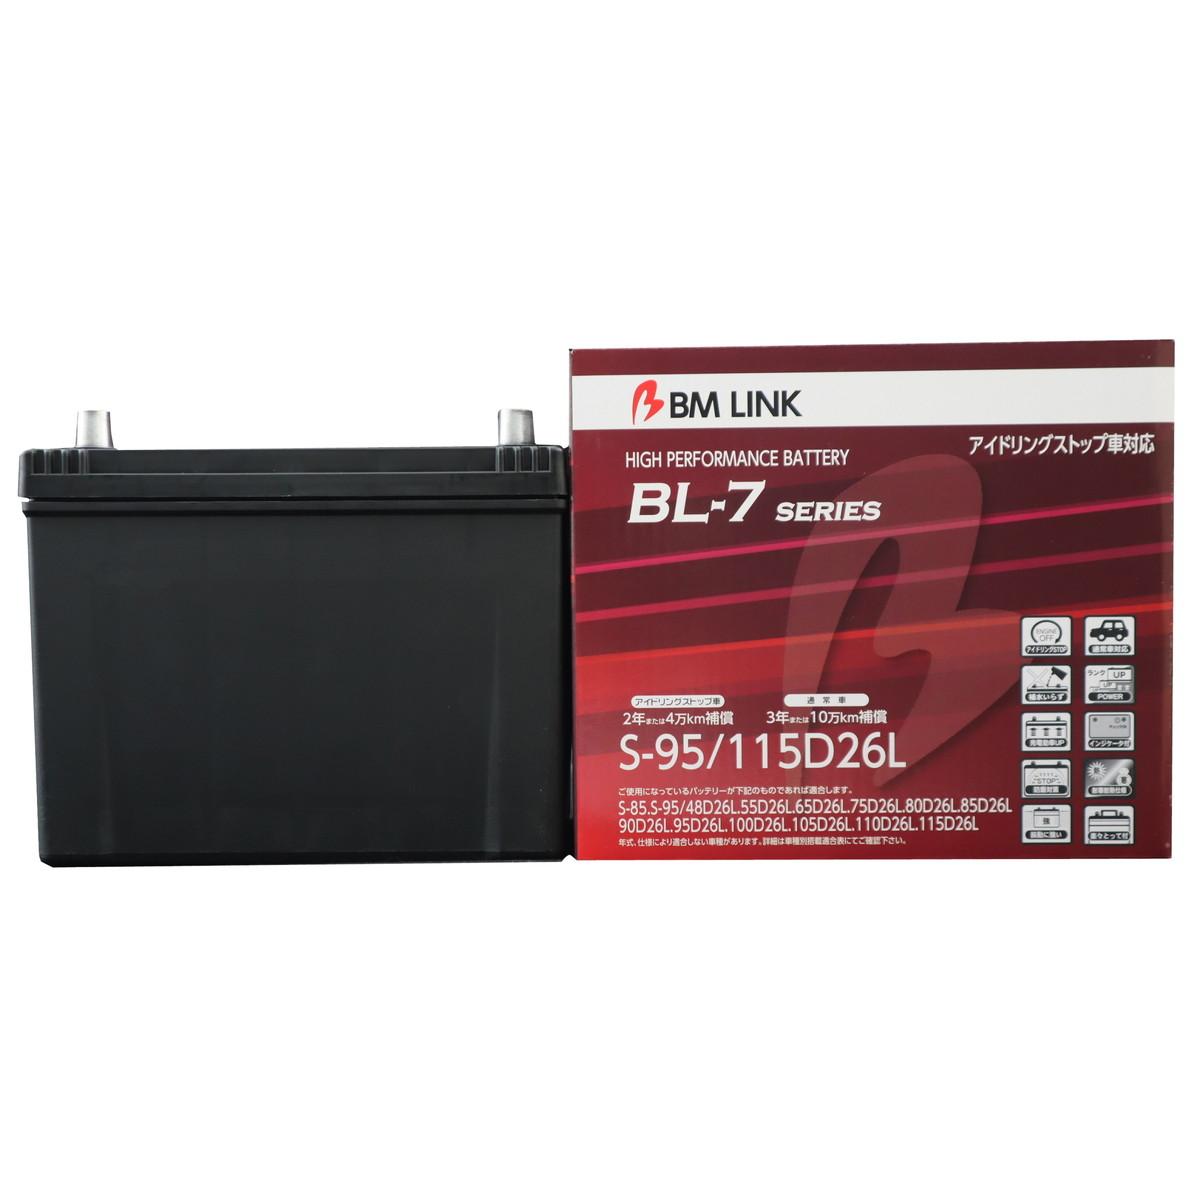 BM LINK BL-7 Series S95/115D26L 自動車用アイドリングストップ車対応バッテリー BL-7シリーズ